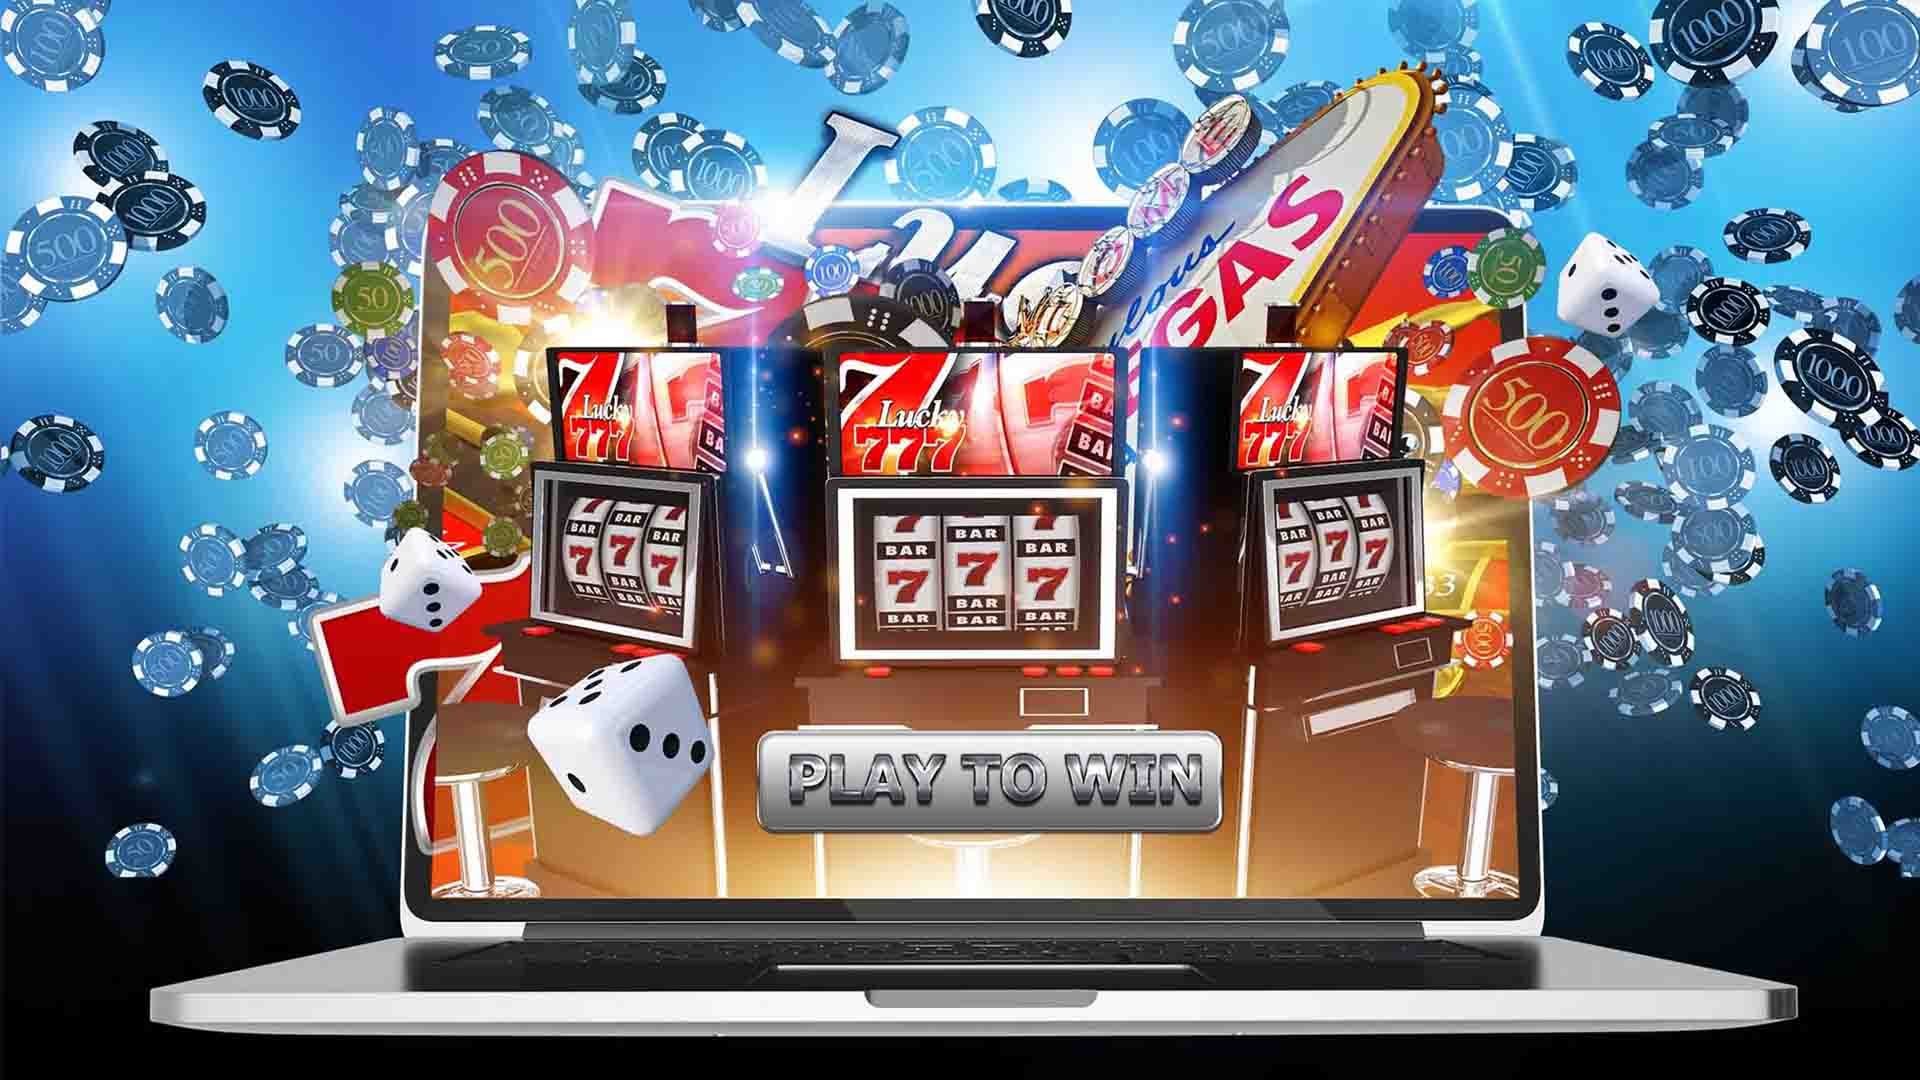 Bandar Judi Online gives the new spheres online gambling